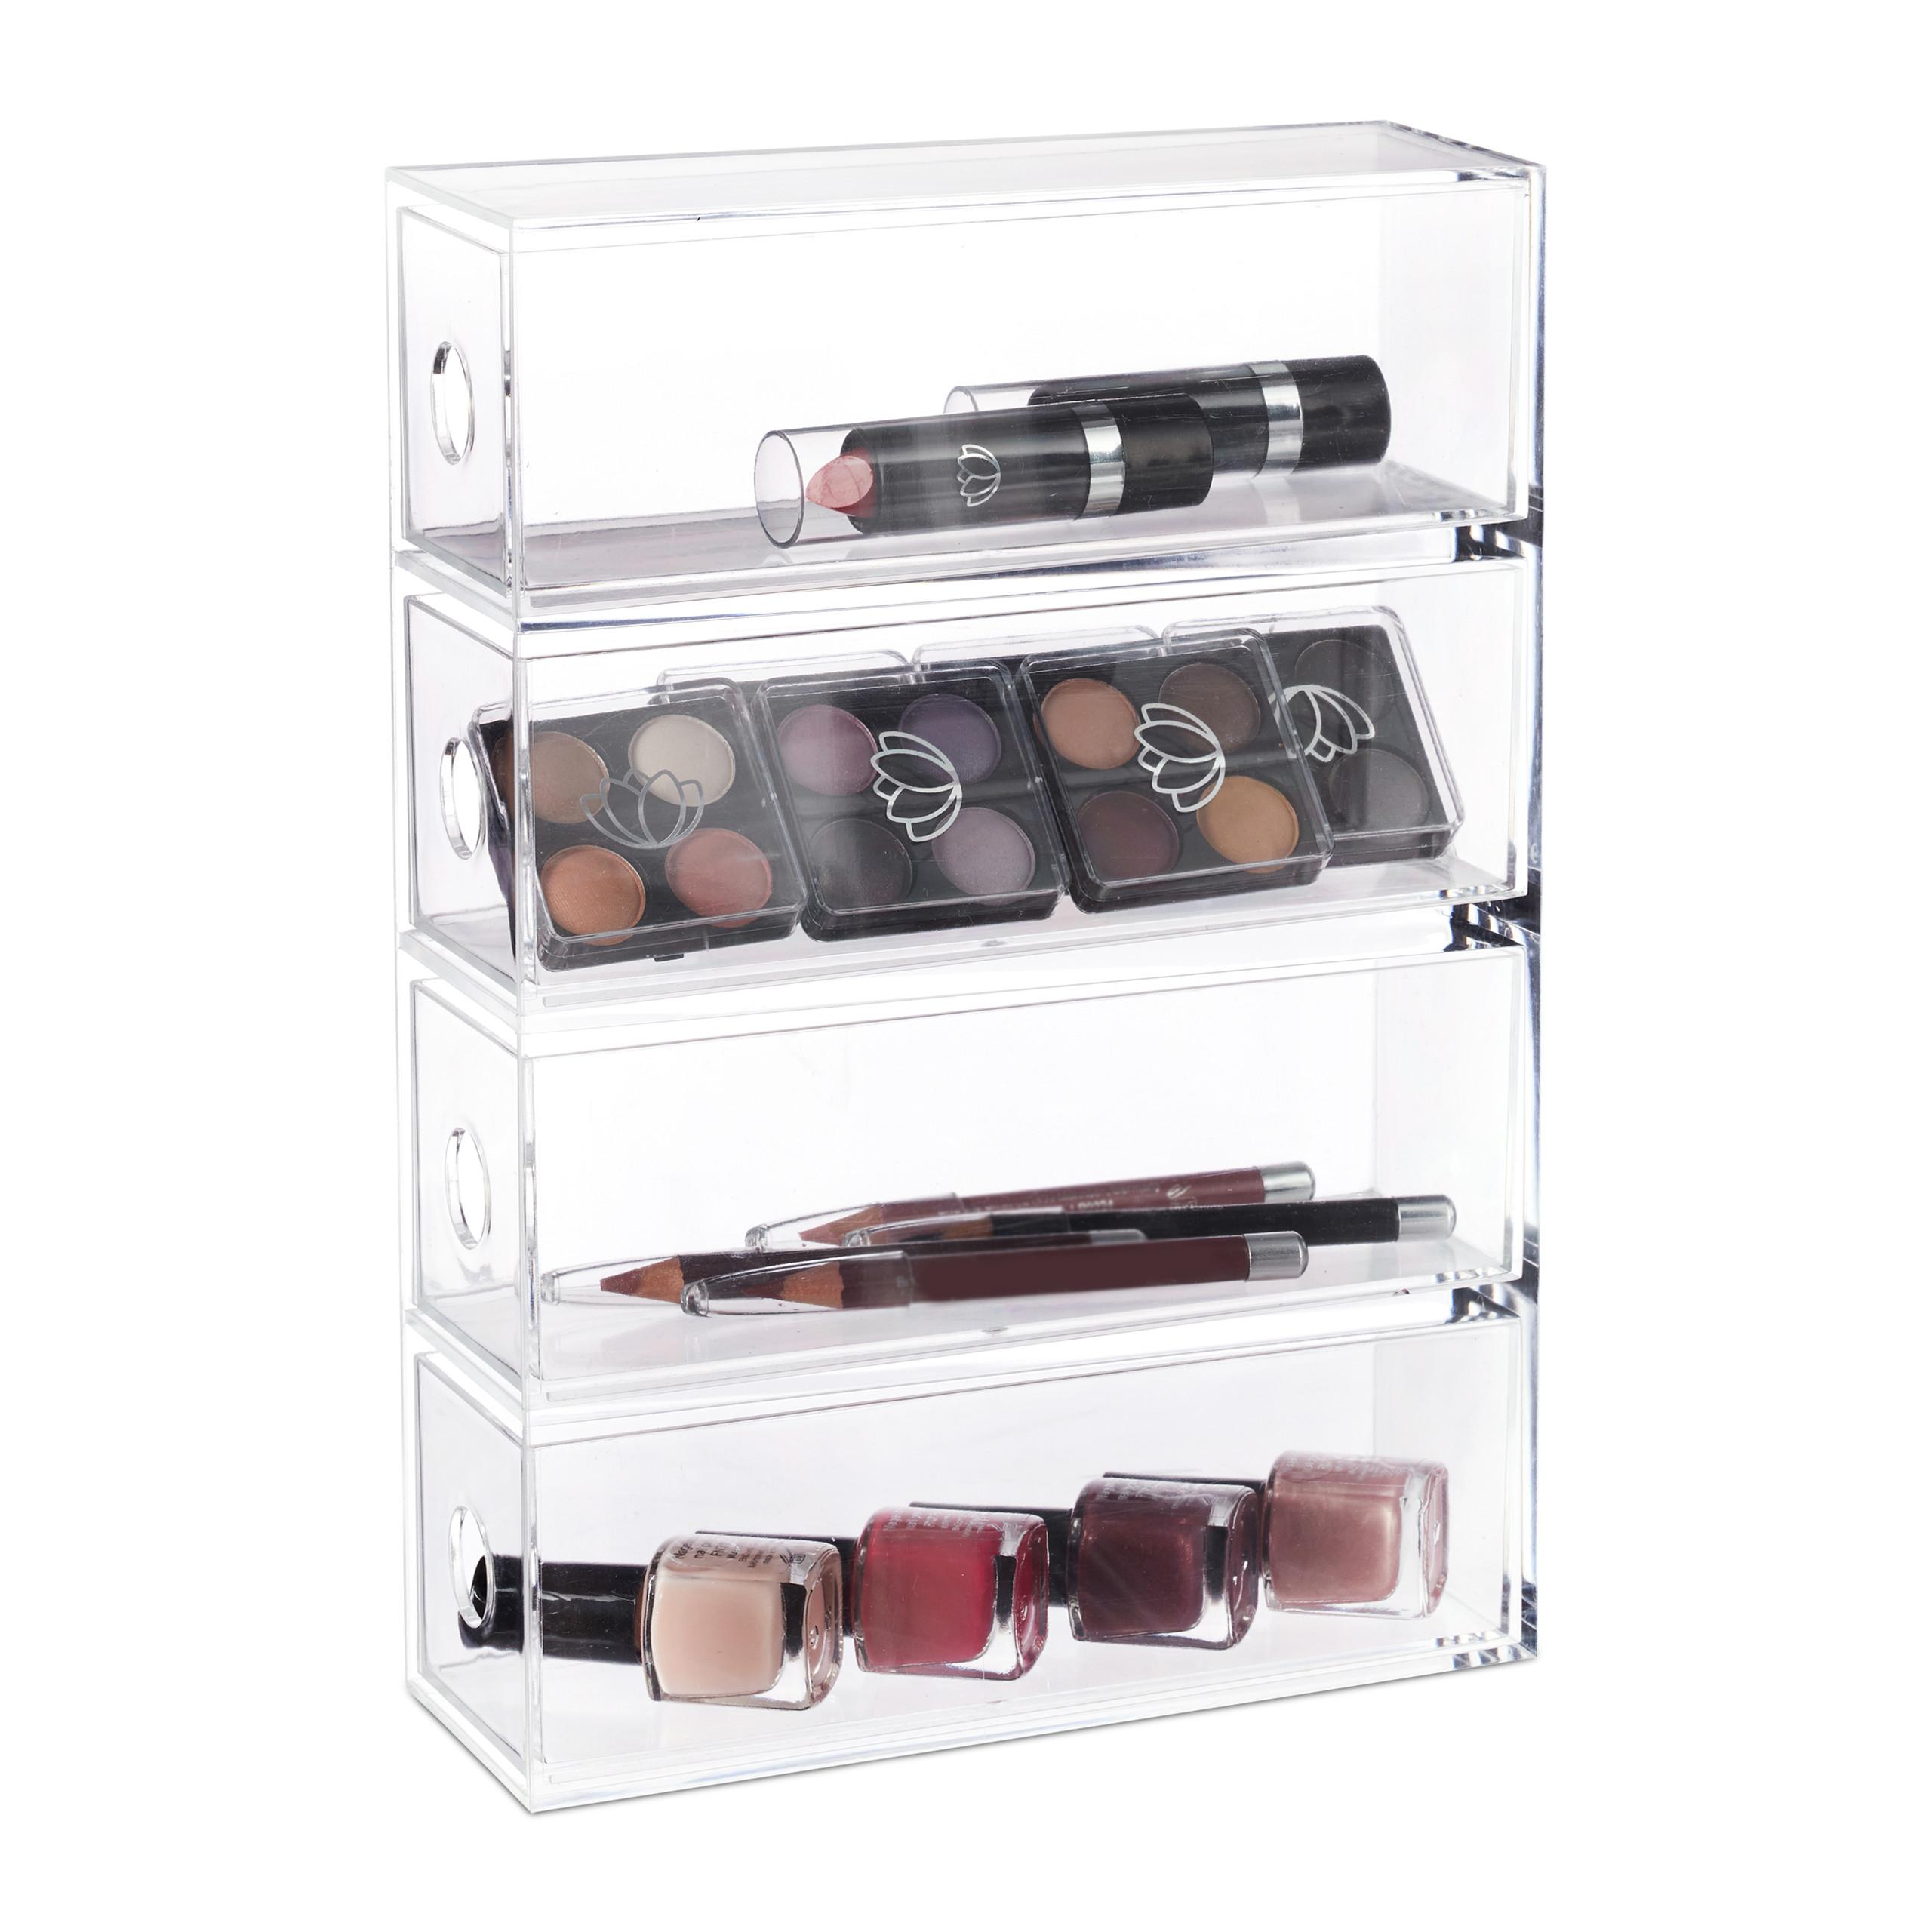 Transparent-Make-Up-Organiser-Storage-Box-with-4-Drawers thumbnail 5